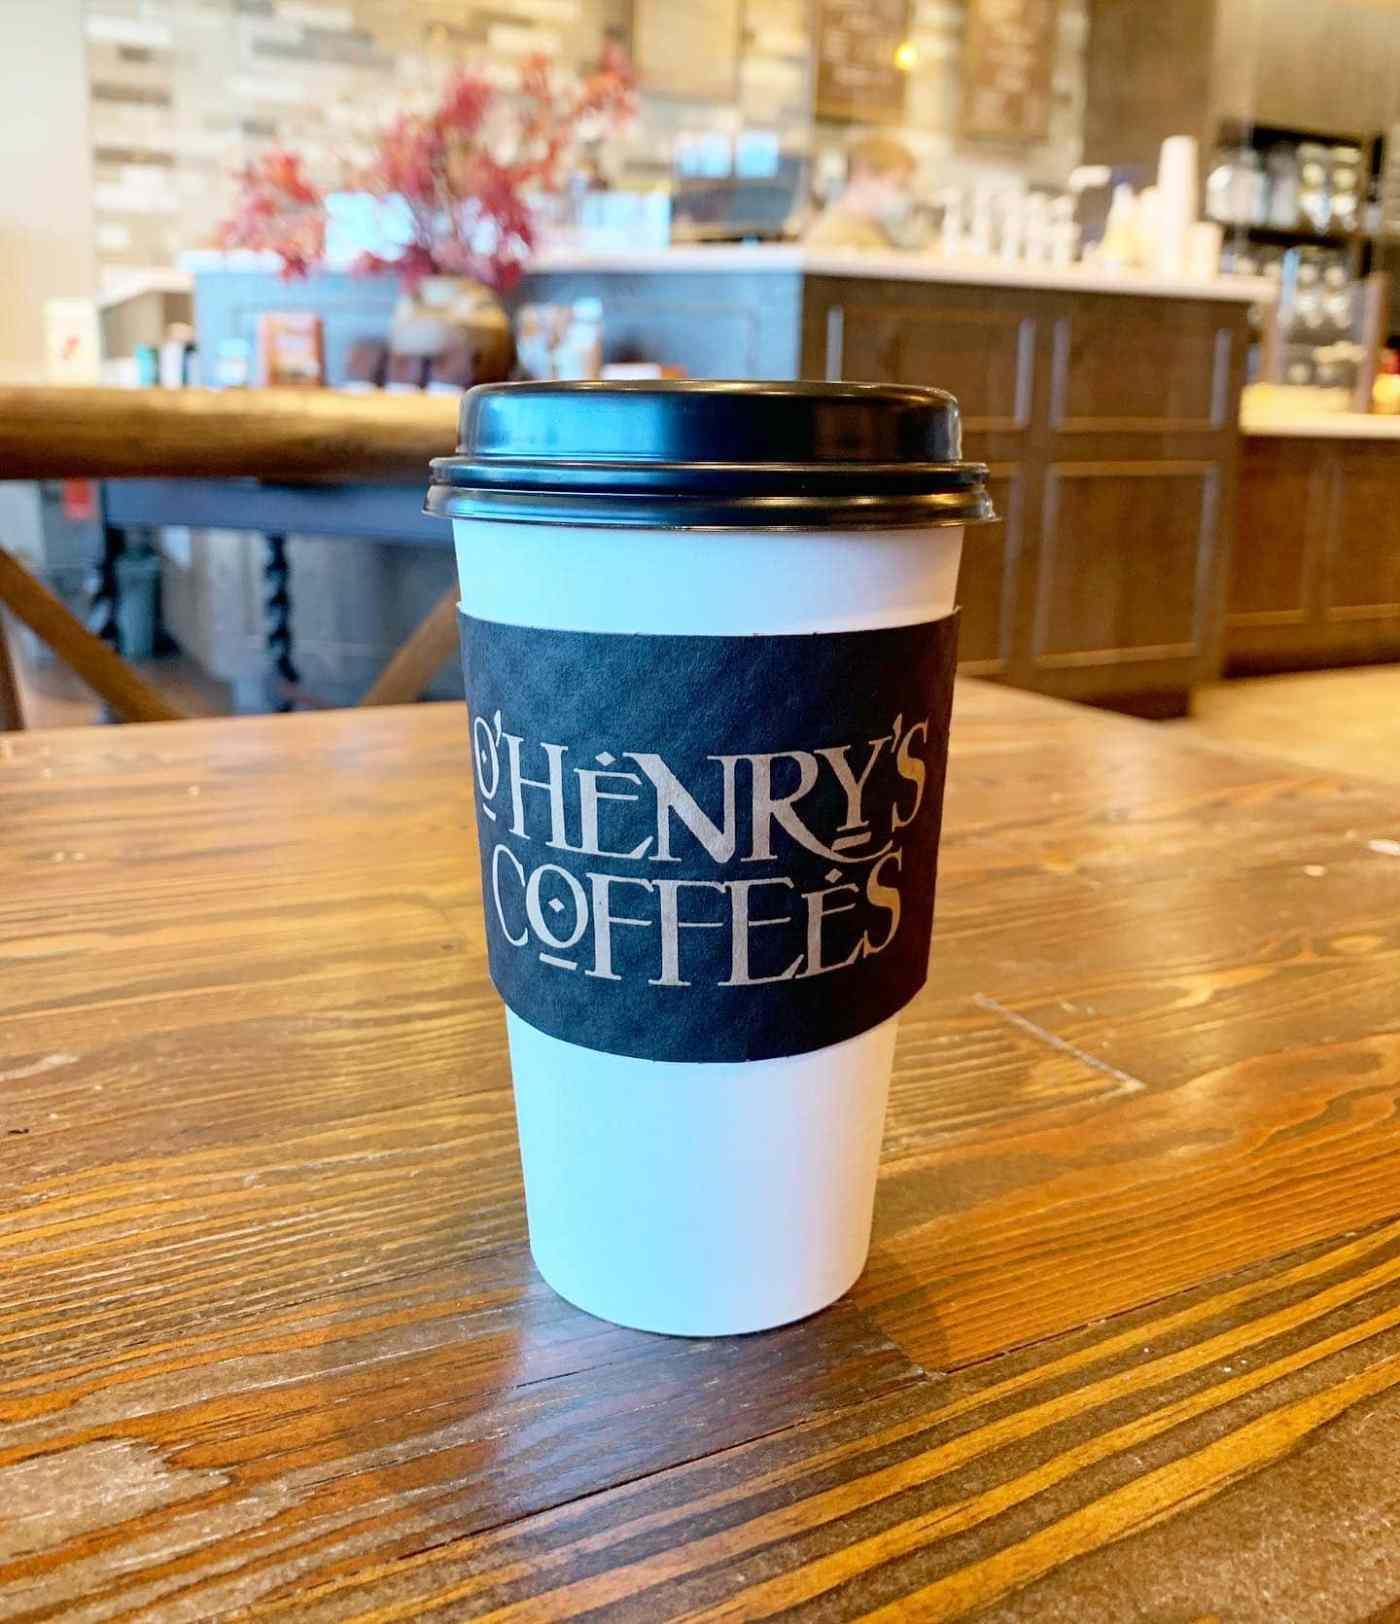 O'Henry's Coffee